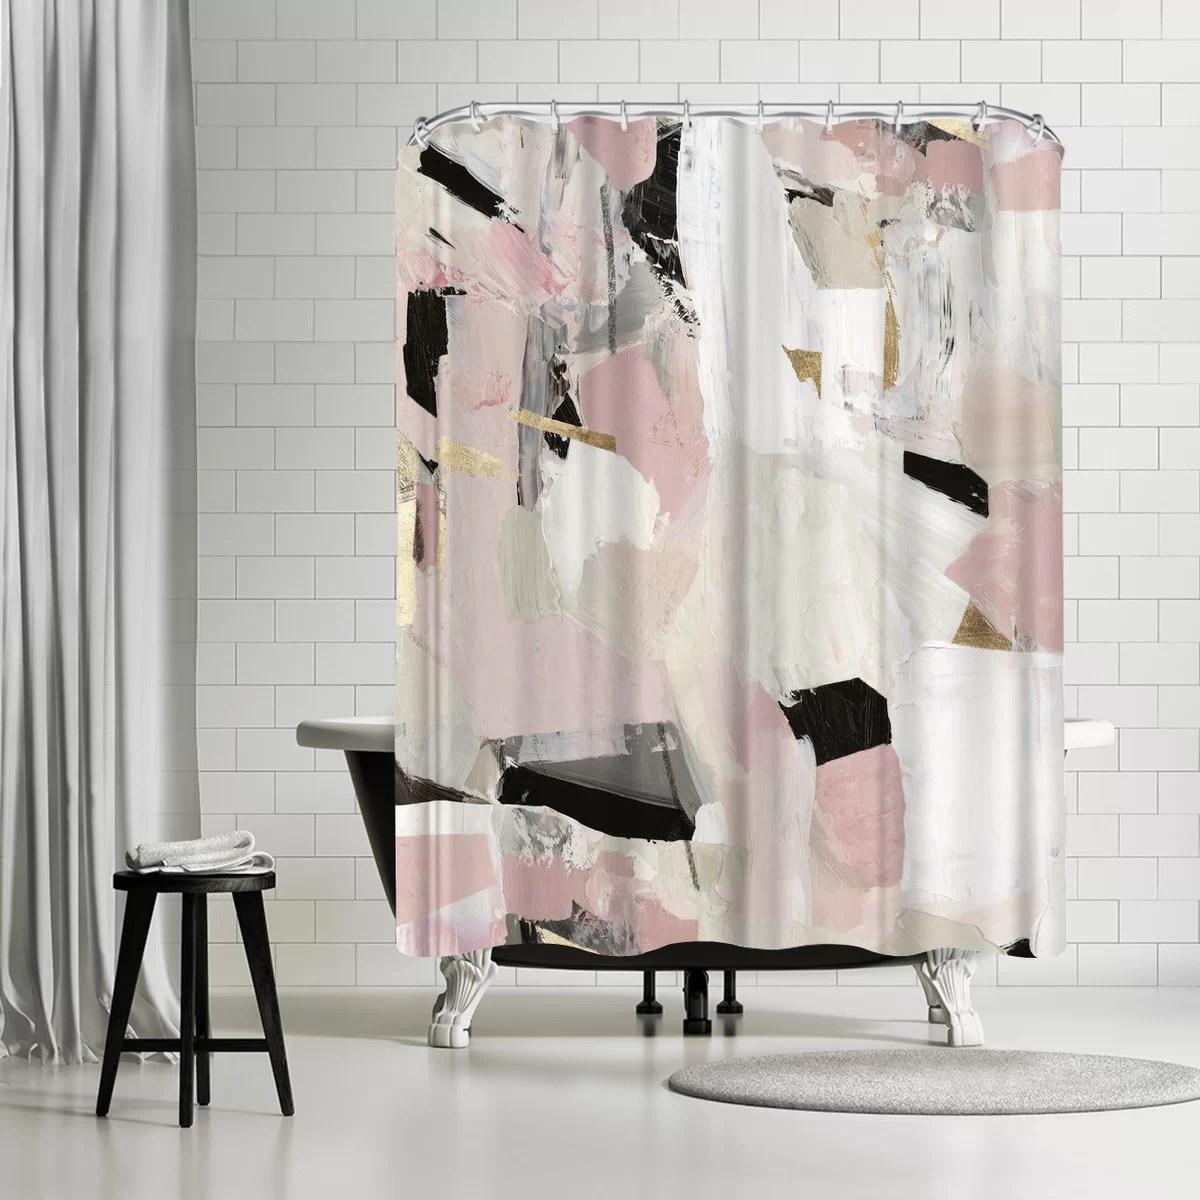 pi creative art black rose gold ii single shower curtain